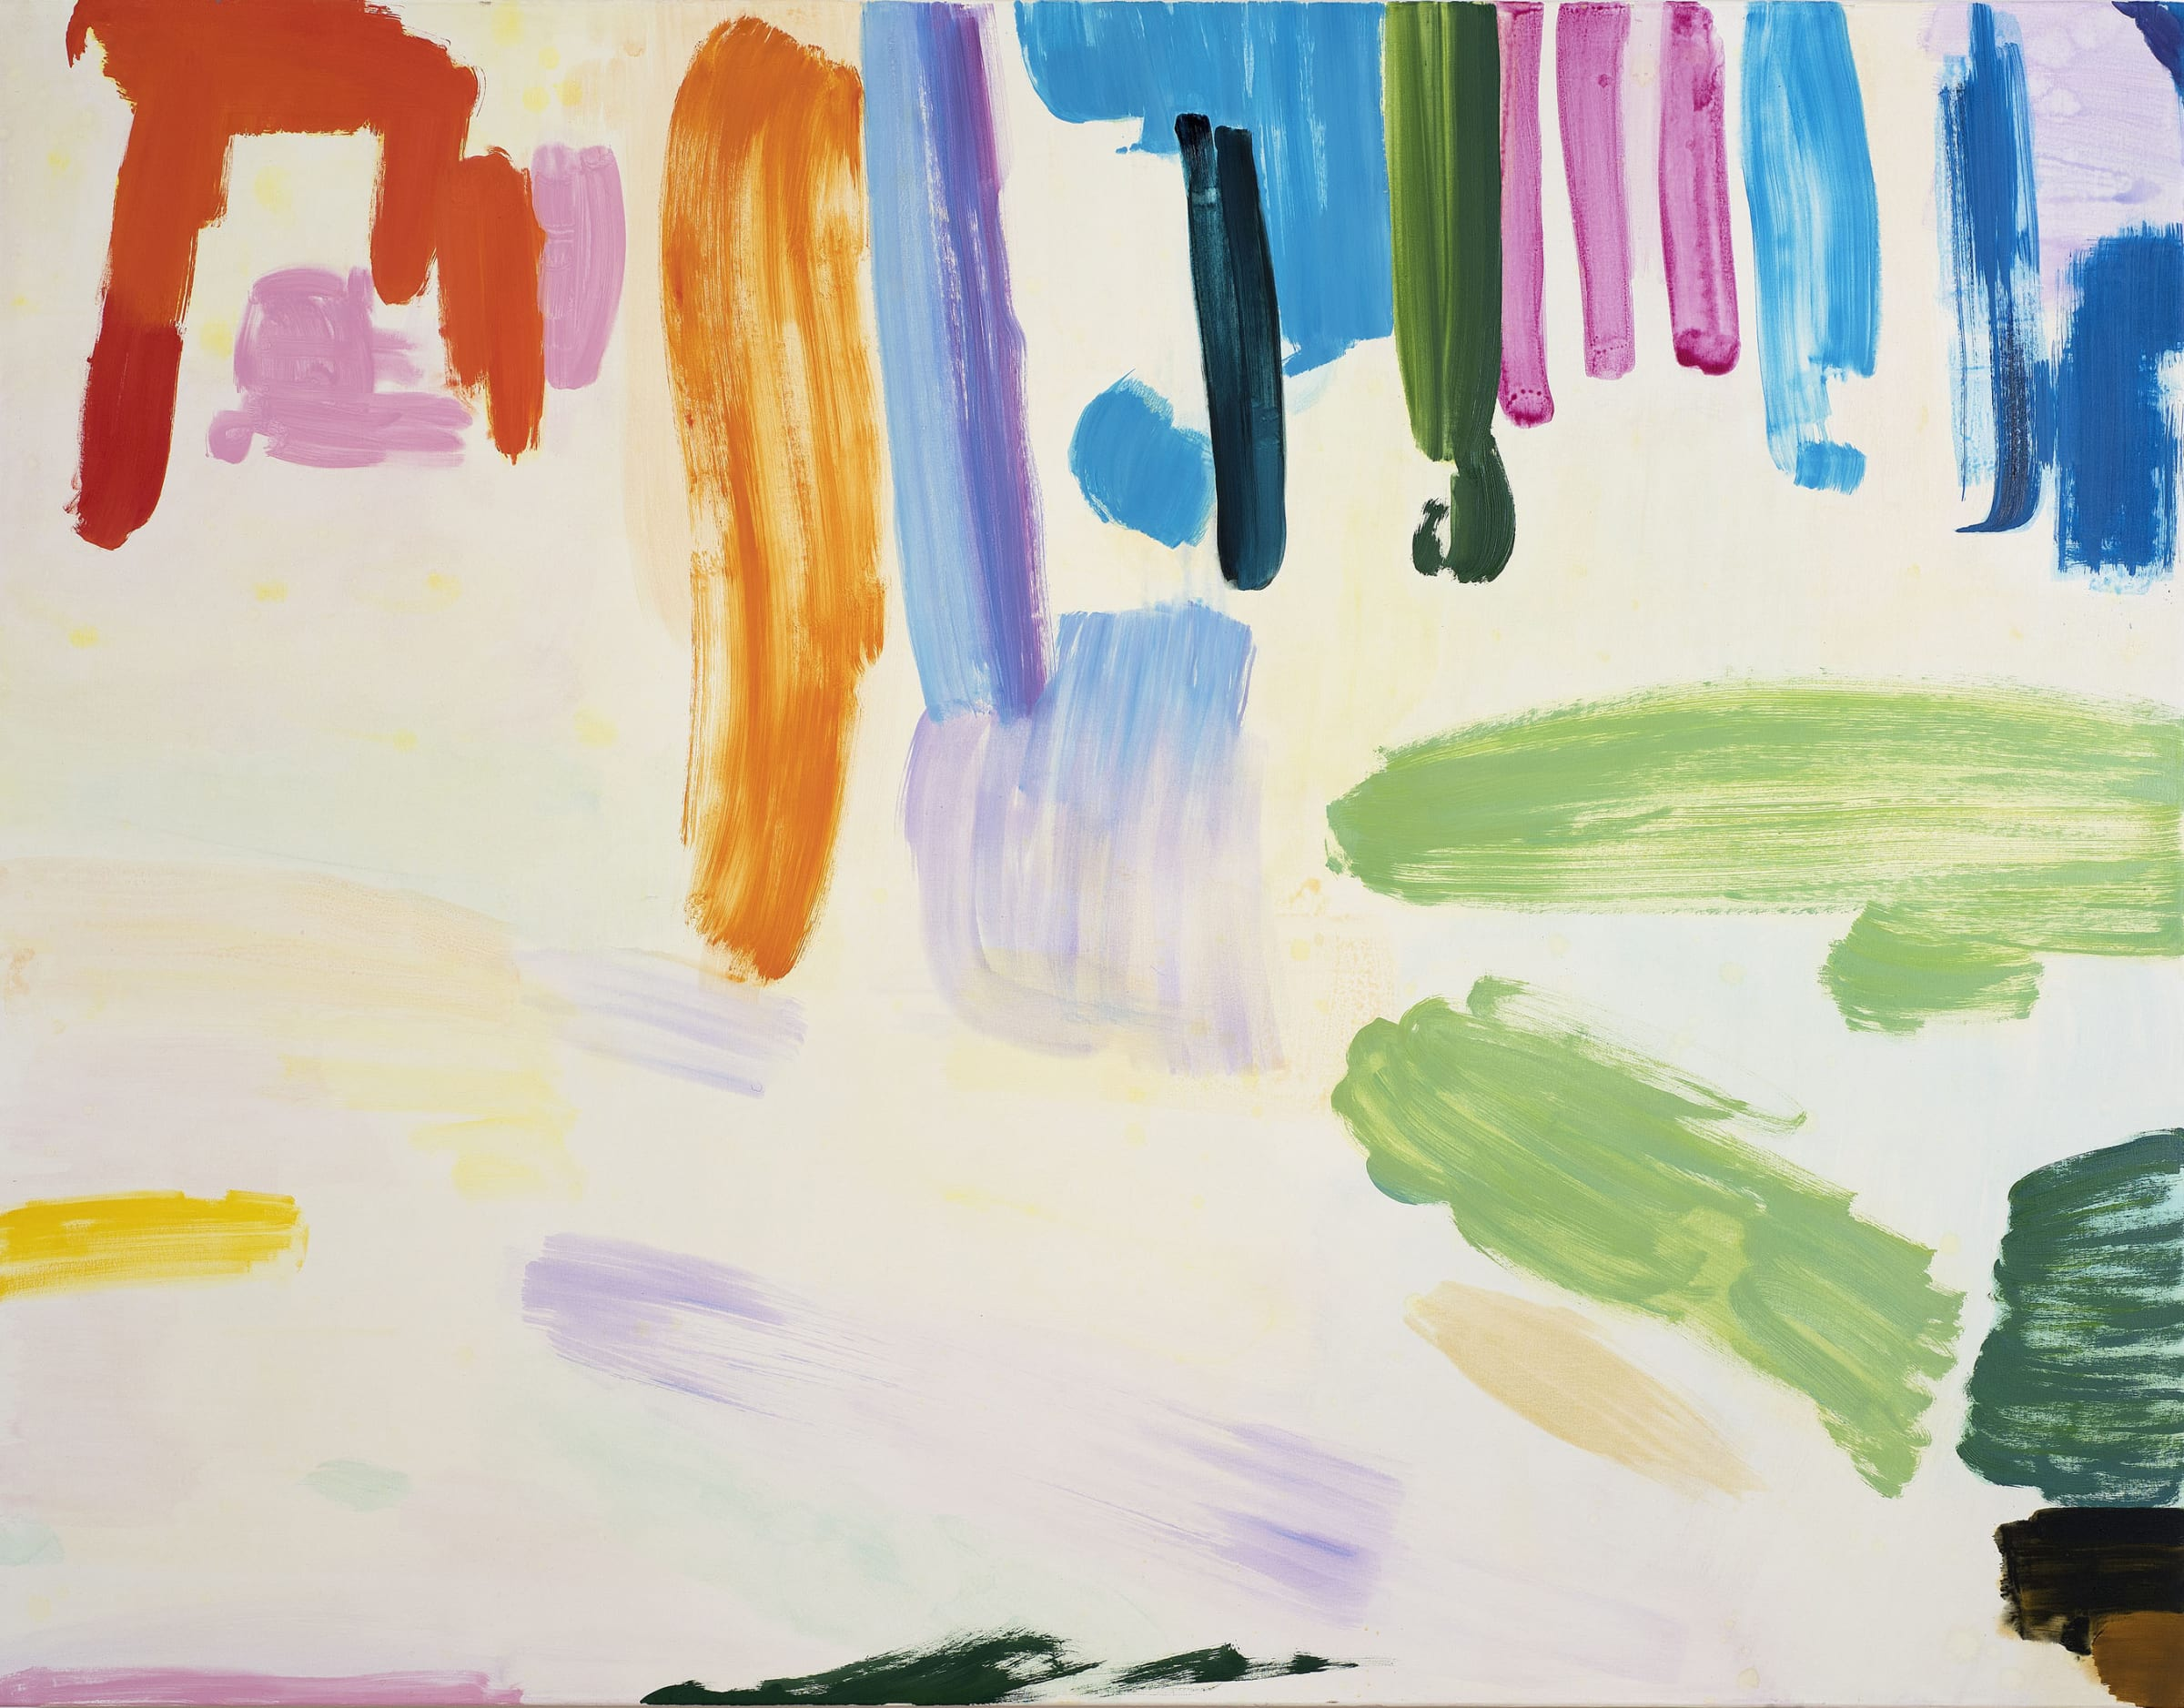 "<span class=""link fancybox-details-link""><a href=""/exhibitions/21/works/artworks980/"">View Detail Page</a></span><div class=""artist""><strong>Tim Braden</strong></div><div class=""title""><em>Cadmium Orange and King's Blue</em>, 2018</div><div class=""medium"">Oil on canvas</div><div class=""dimensions"">140x180cm (55x71"")</div>"